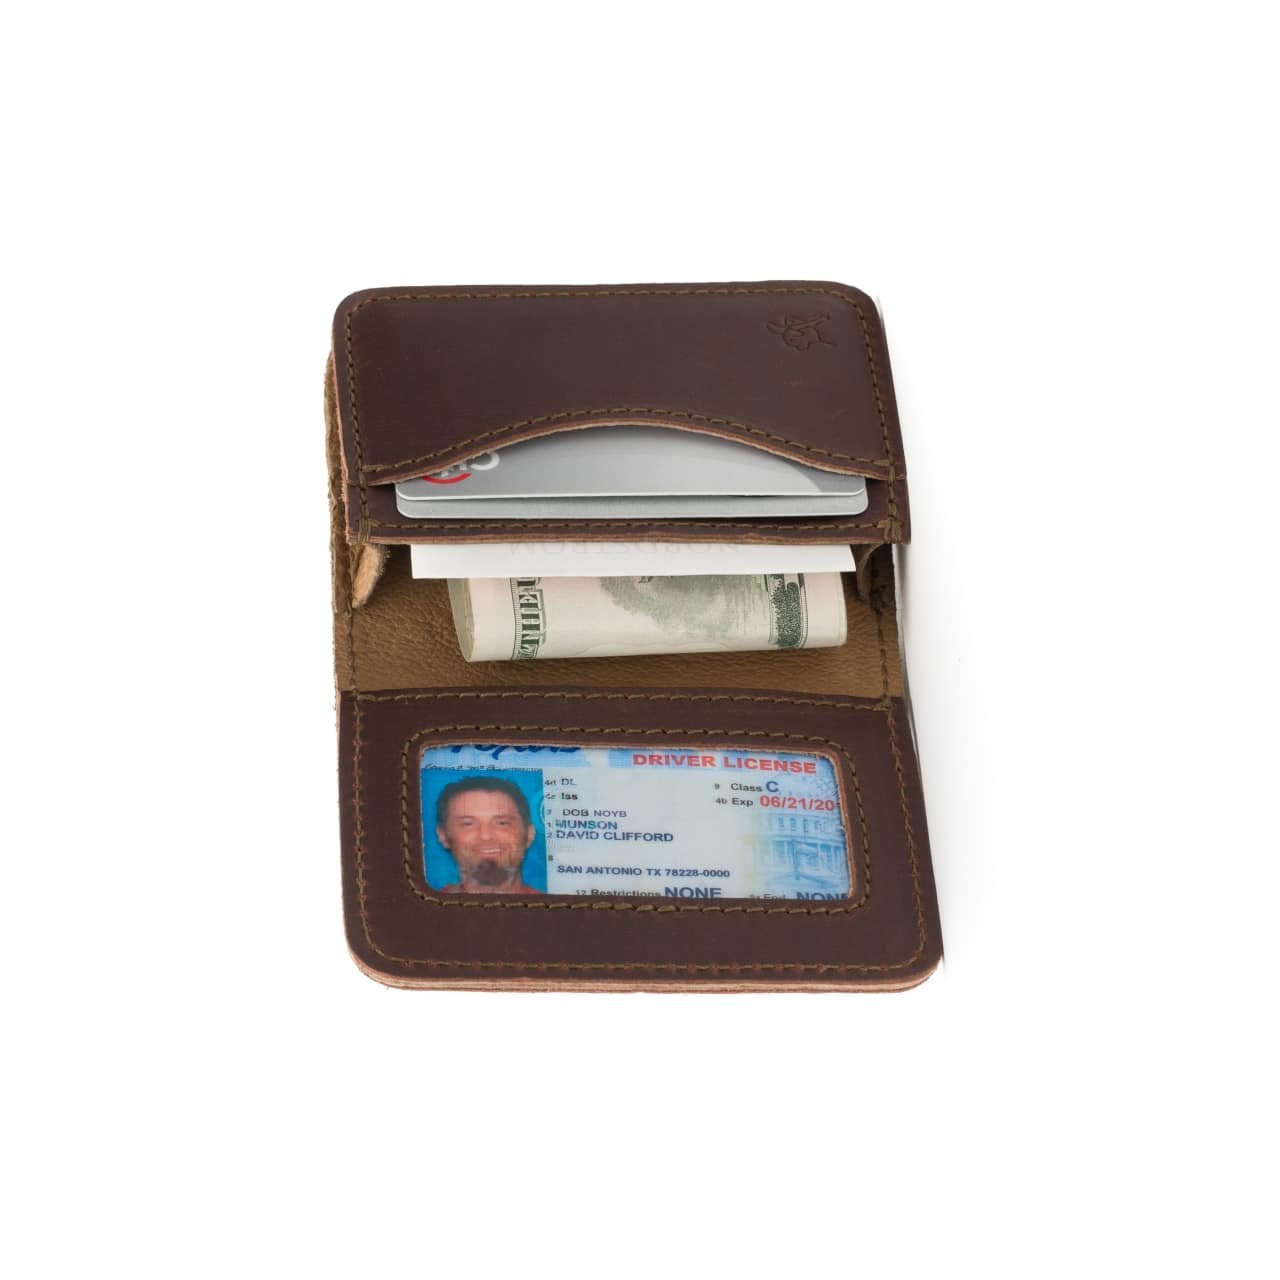 leather handmade wallet. Leather Wallet.Men Leather wallet.Men/'s Leather Coin Purse.Men leather Biffold wallet.Men/'s Leather Organizer 201